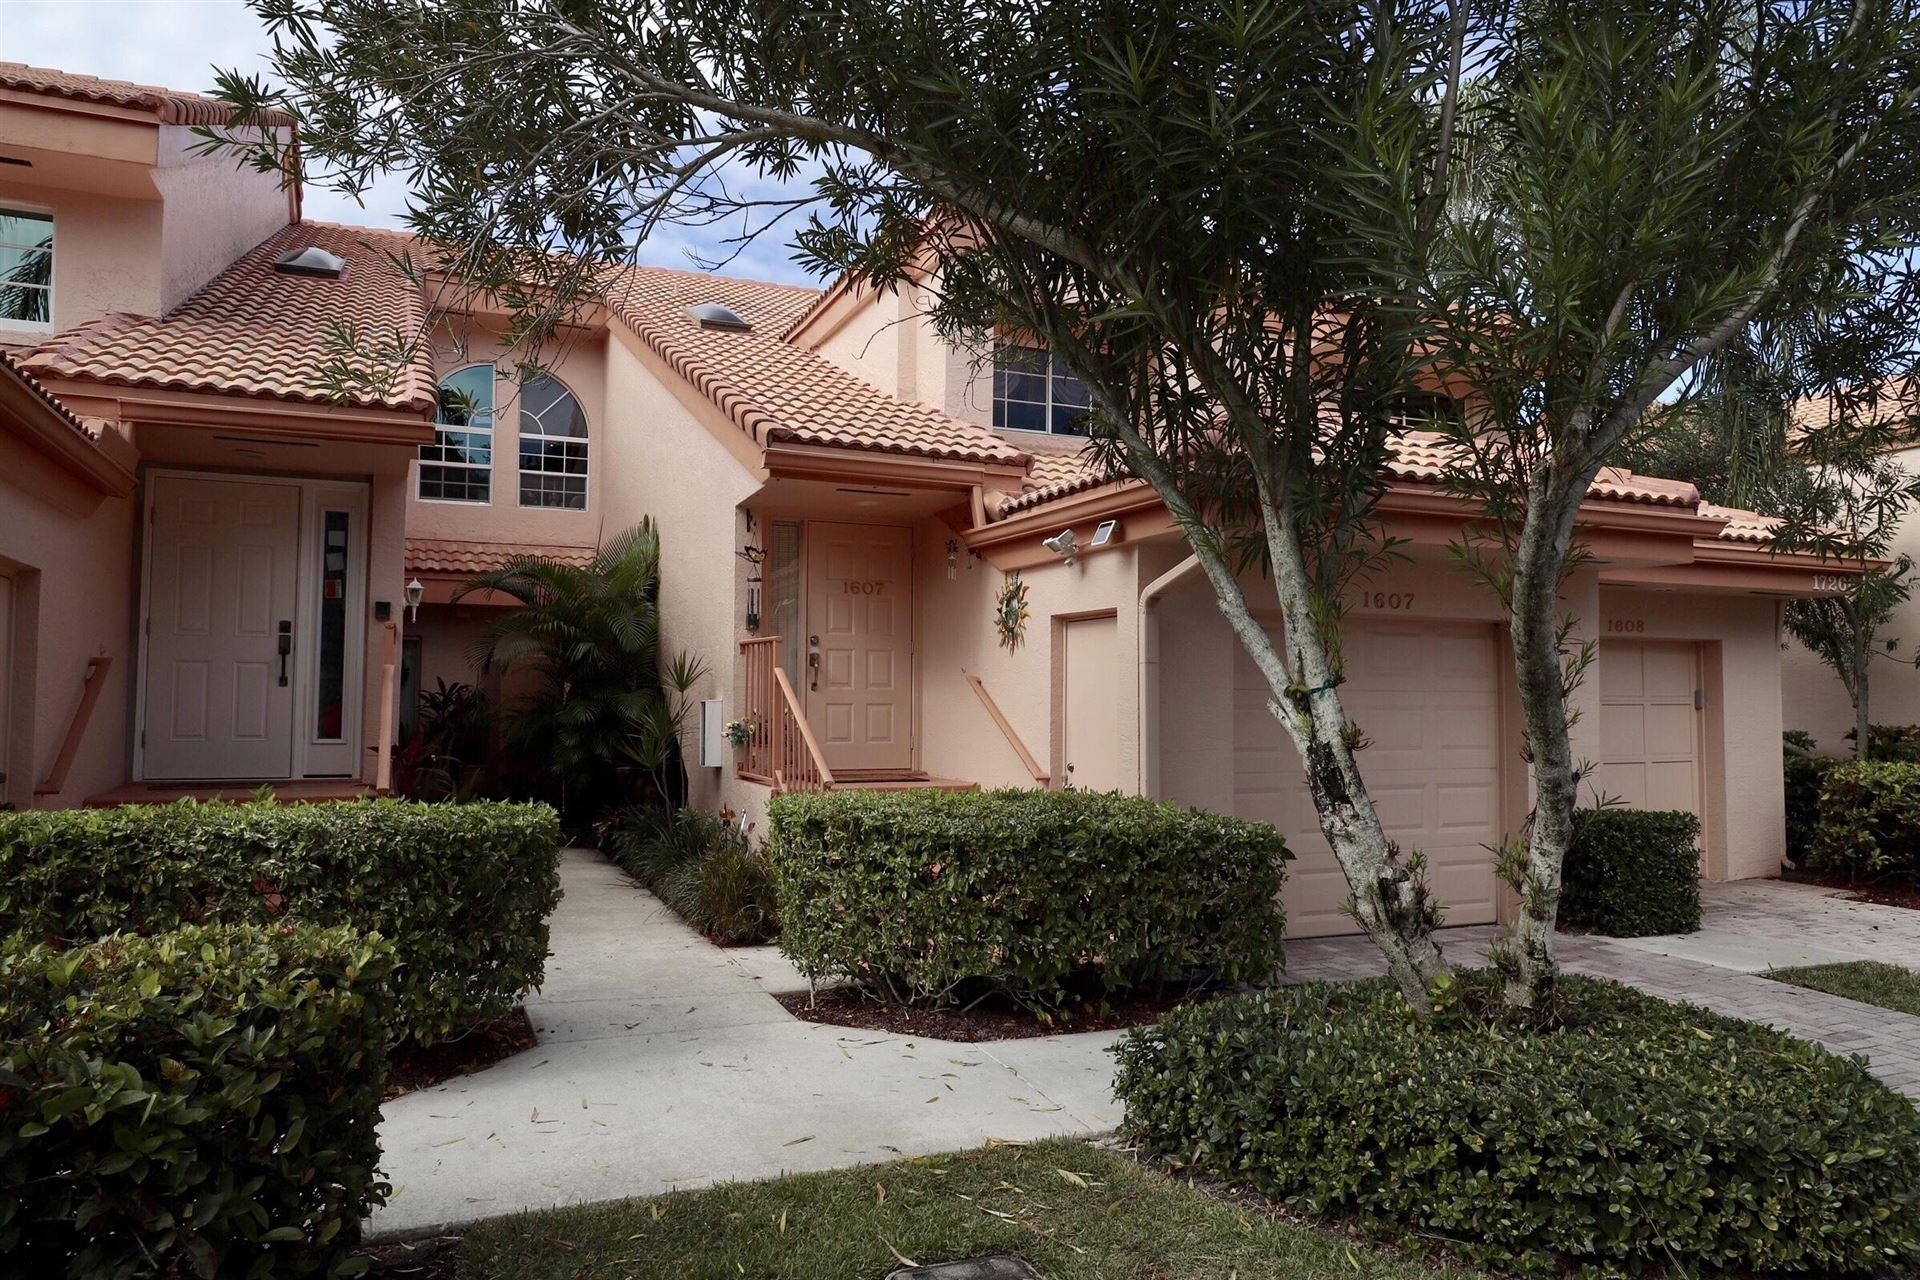 17266 Boca Club 1607 Boulevard #1607, Boca Raton, FL 33487 - MLS#: RX-10723252